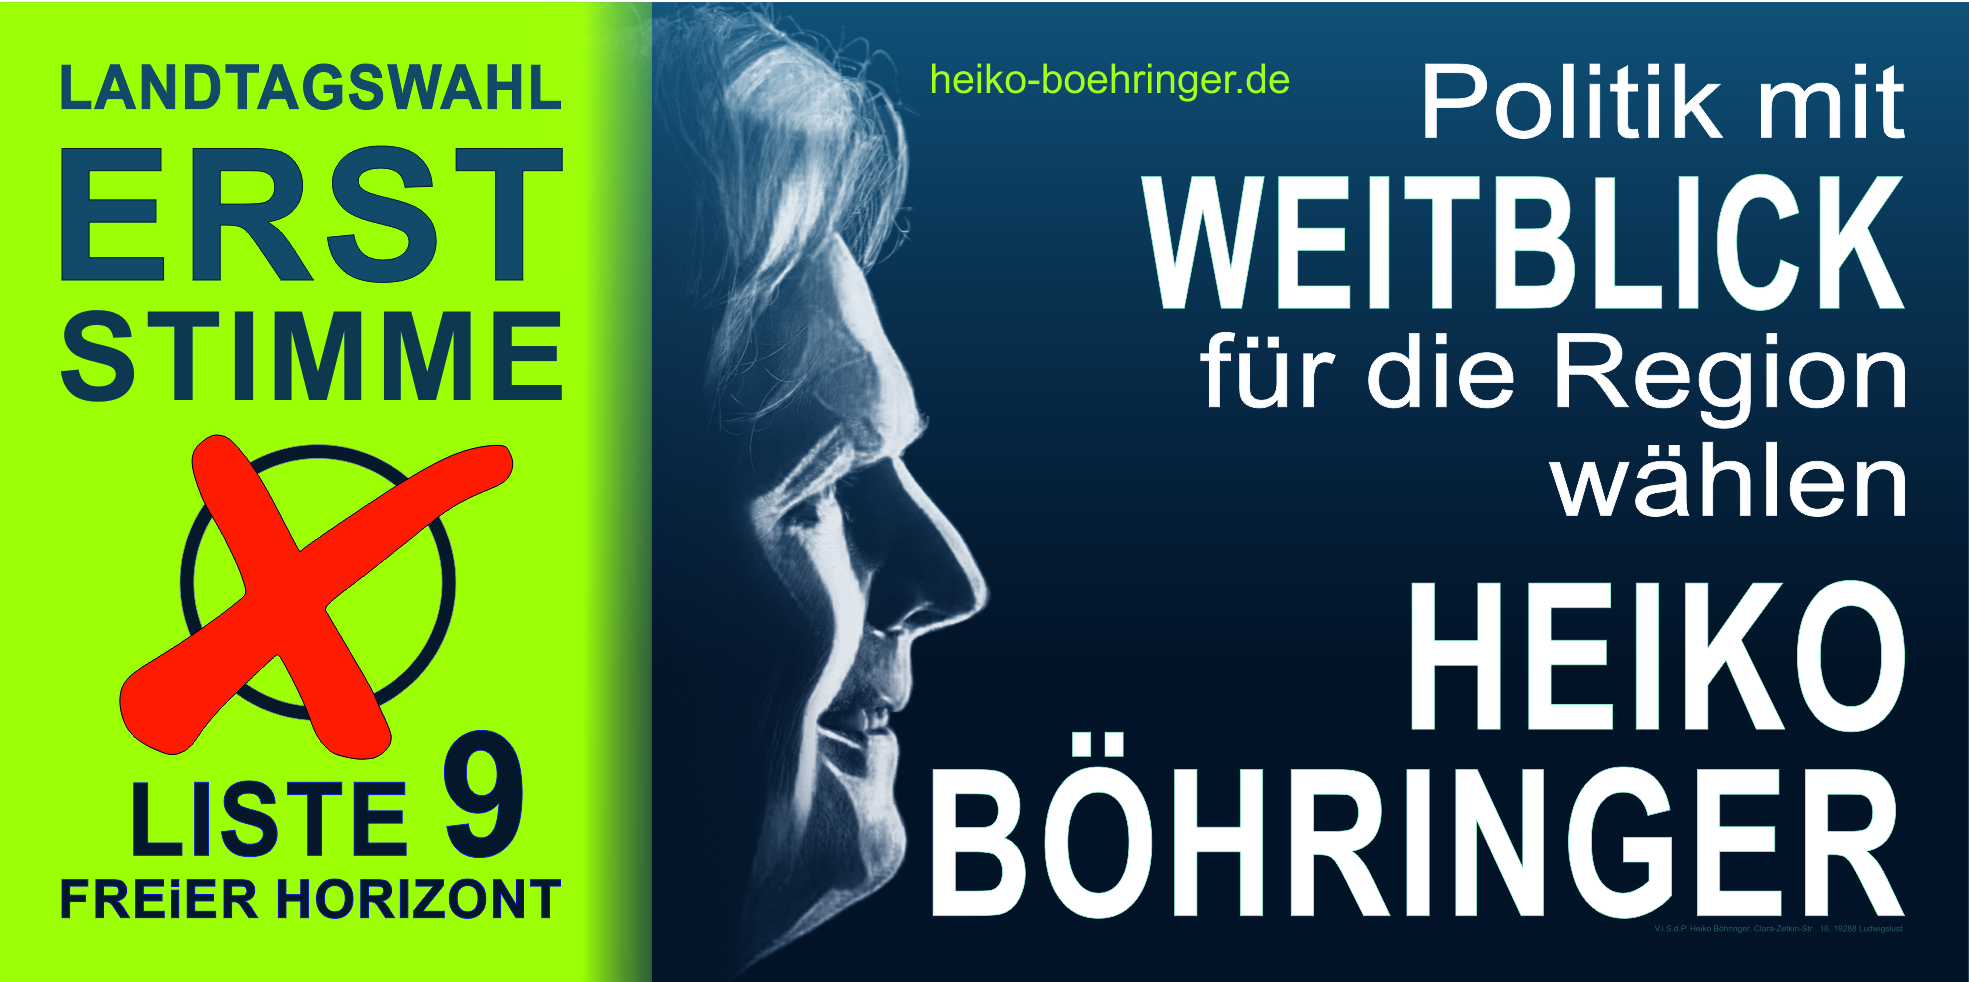 Heiko Böhringer - Direktkandidat FREiER HORIZONT Landtagswahlen MV 2021